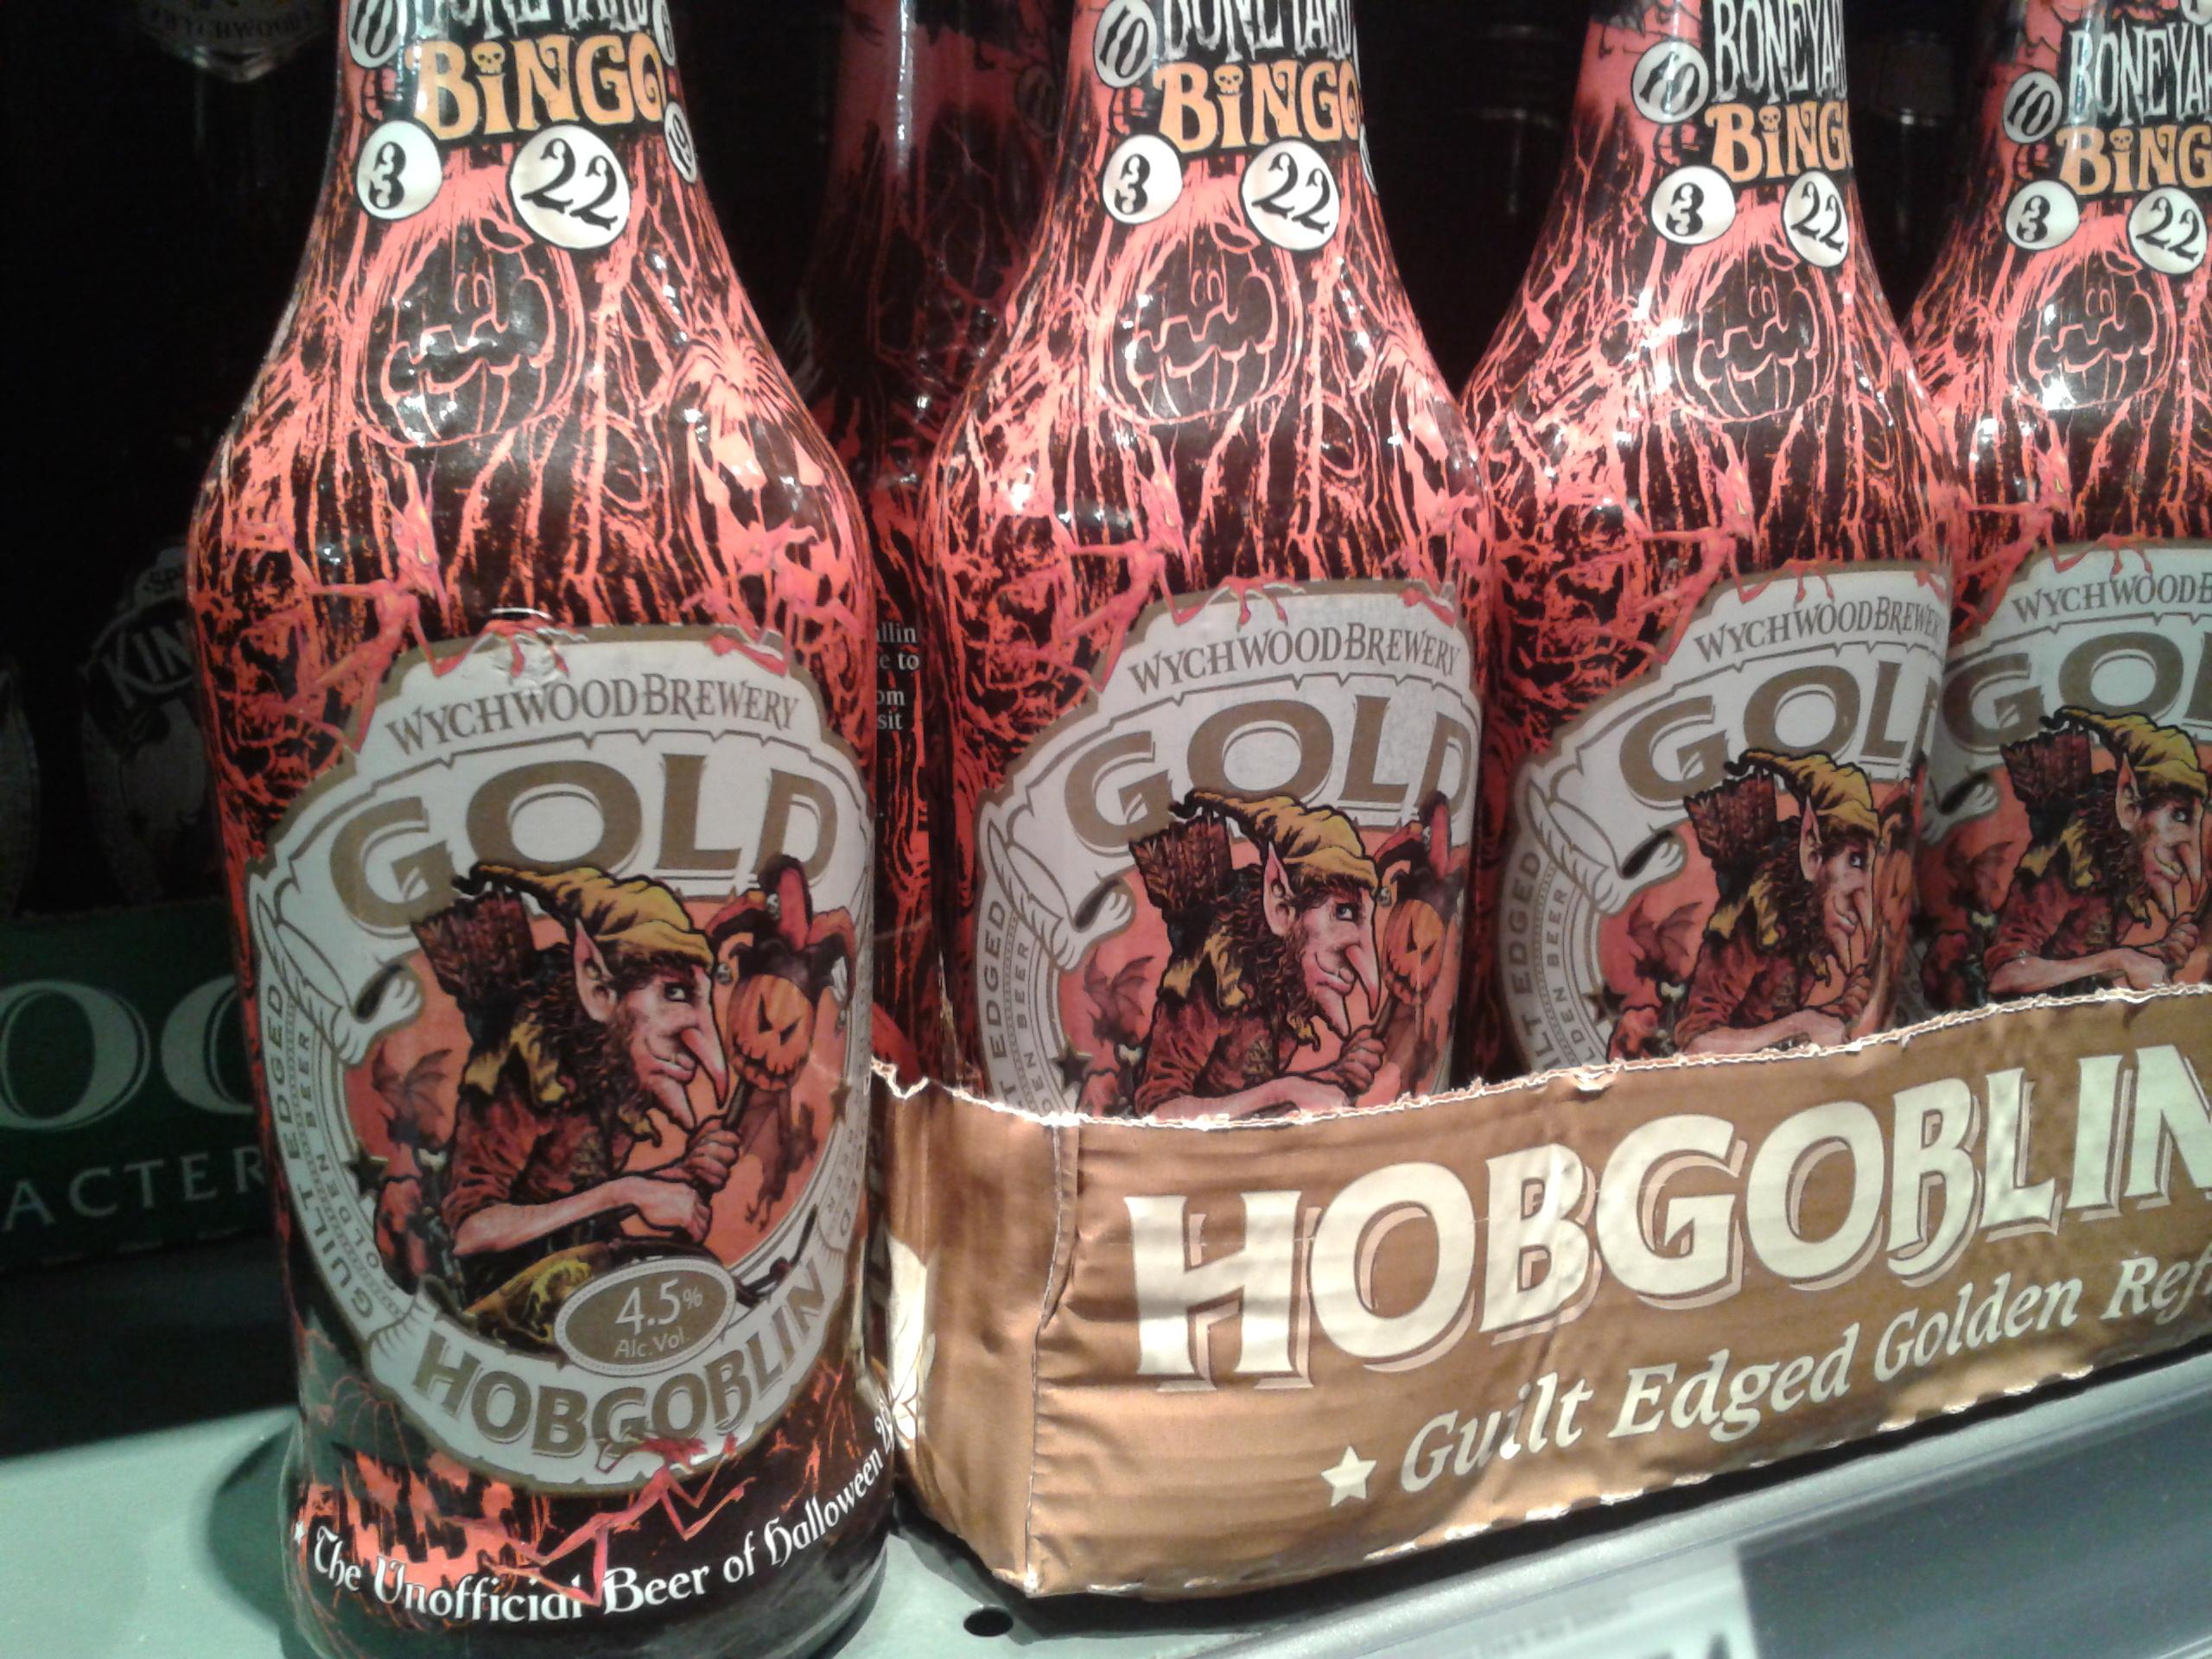 Hobgoblin Gold Beer Bottles - Halloween 2016.